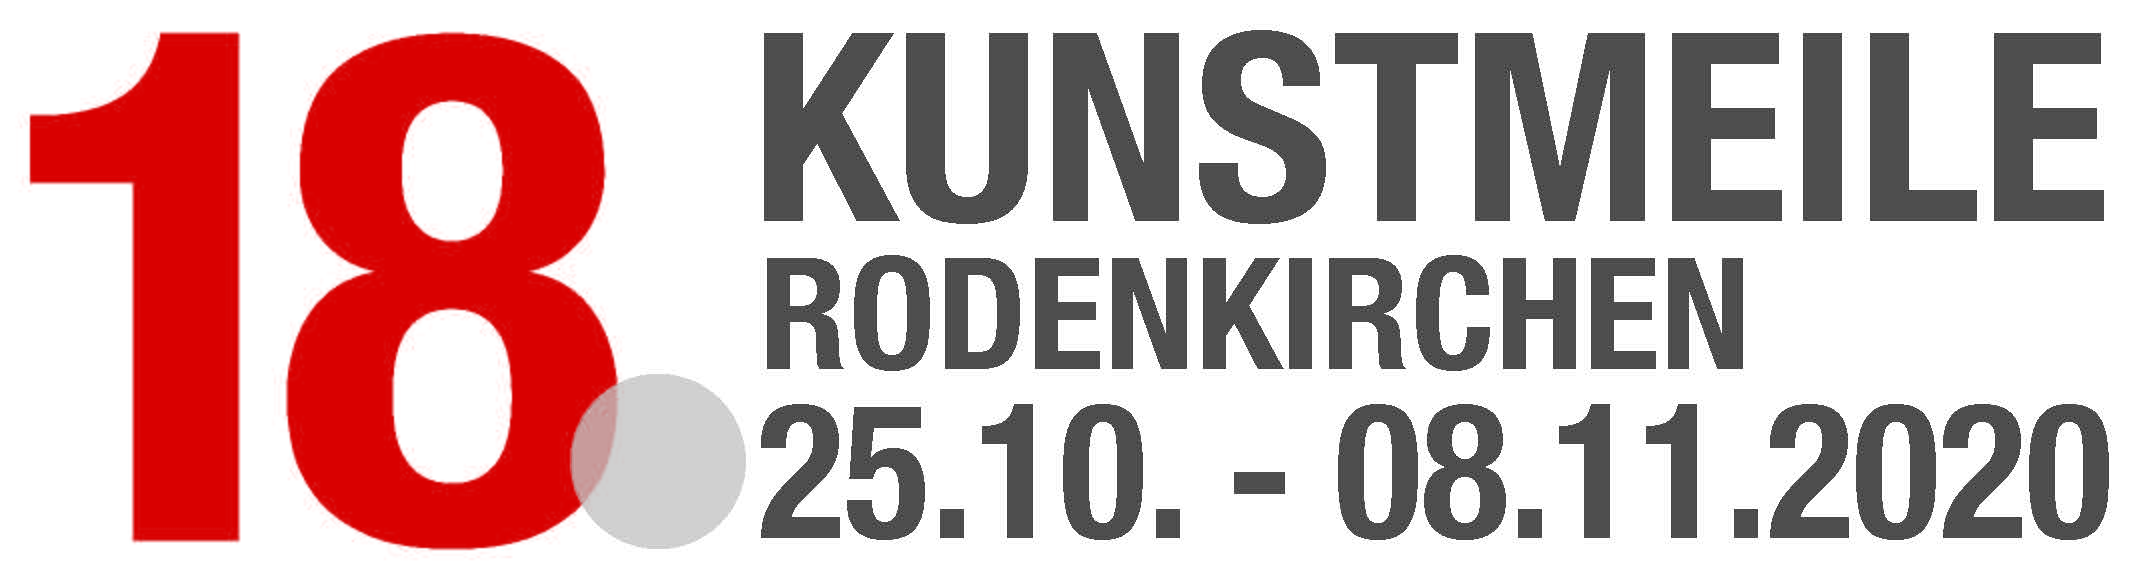 Kunstmeile Rodenkirchen 2020